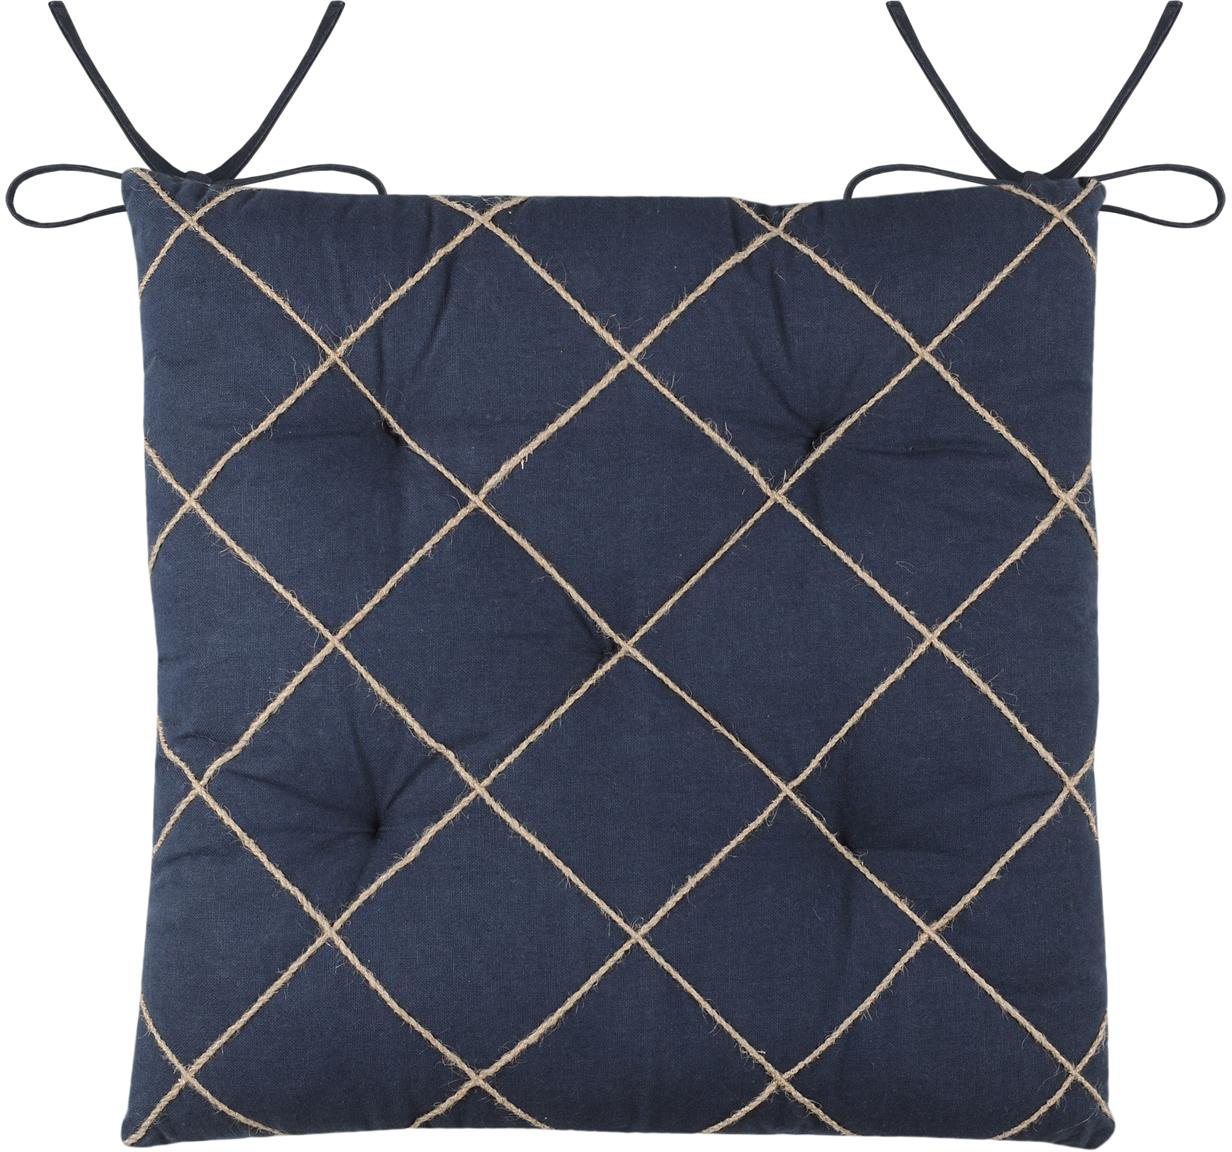 Cuscino sedia Concarneau, Cotone, Blu scuro, Larg. 40 x Lung. 40 cm